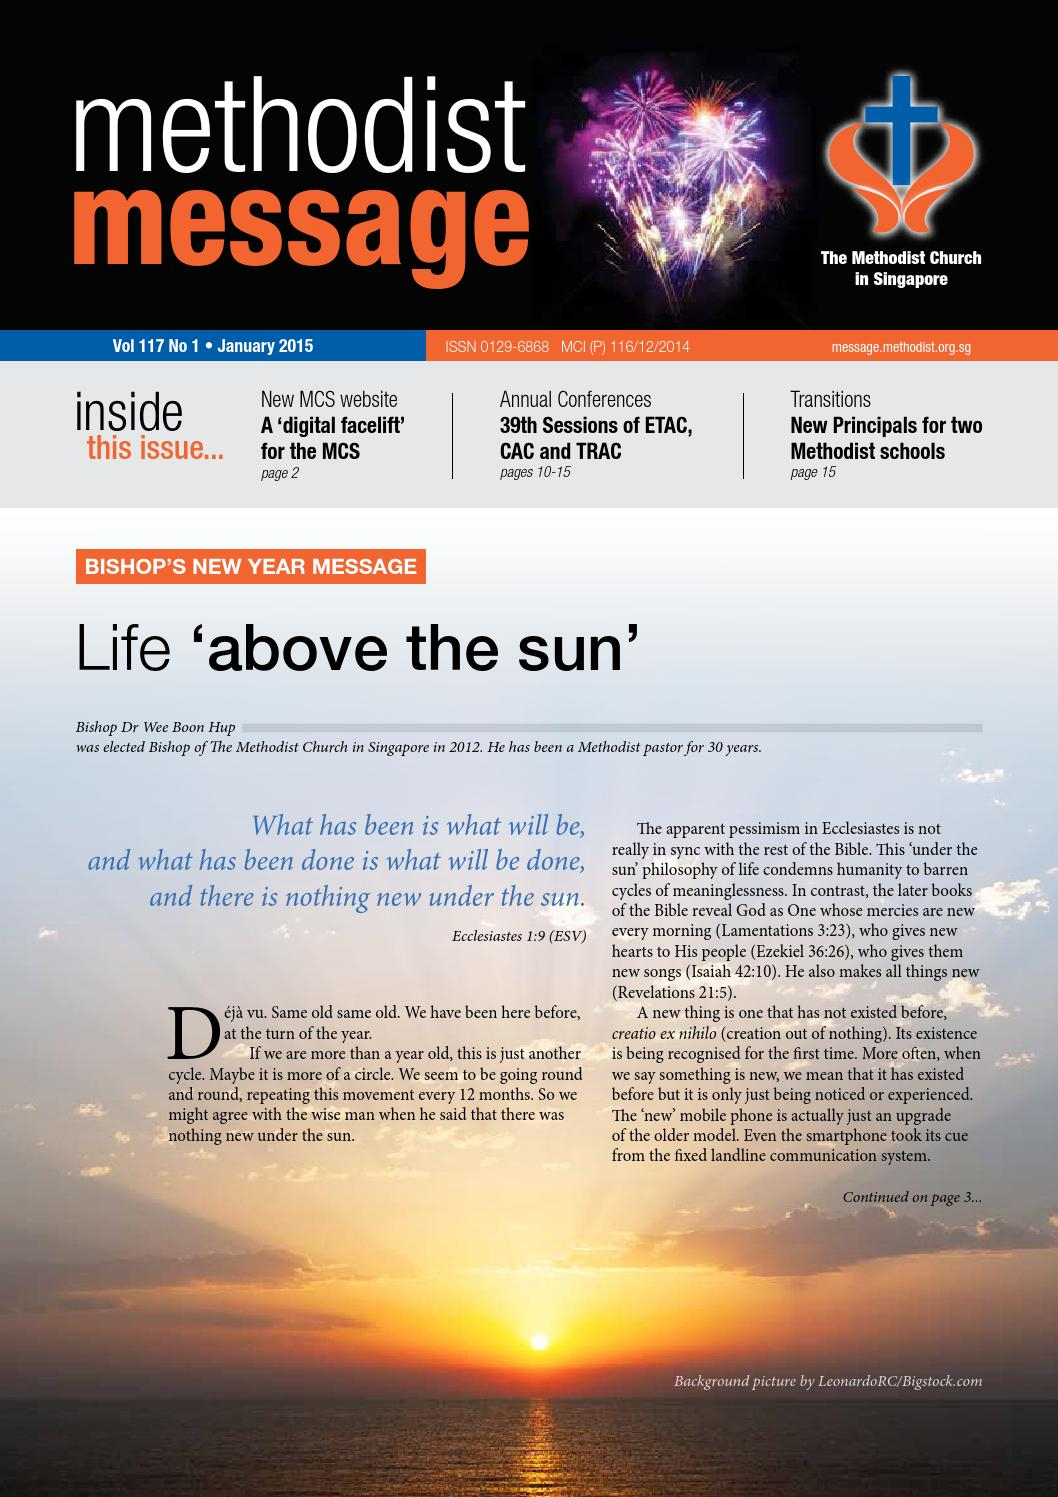 Methodist Message: January 2015 Issue by Methodist Message